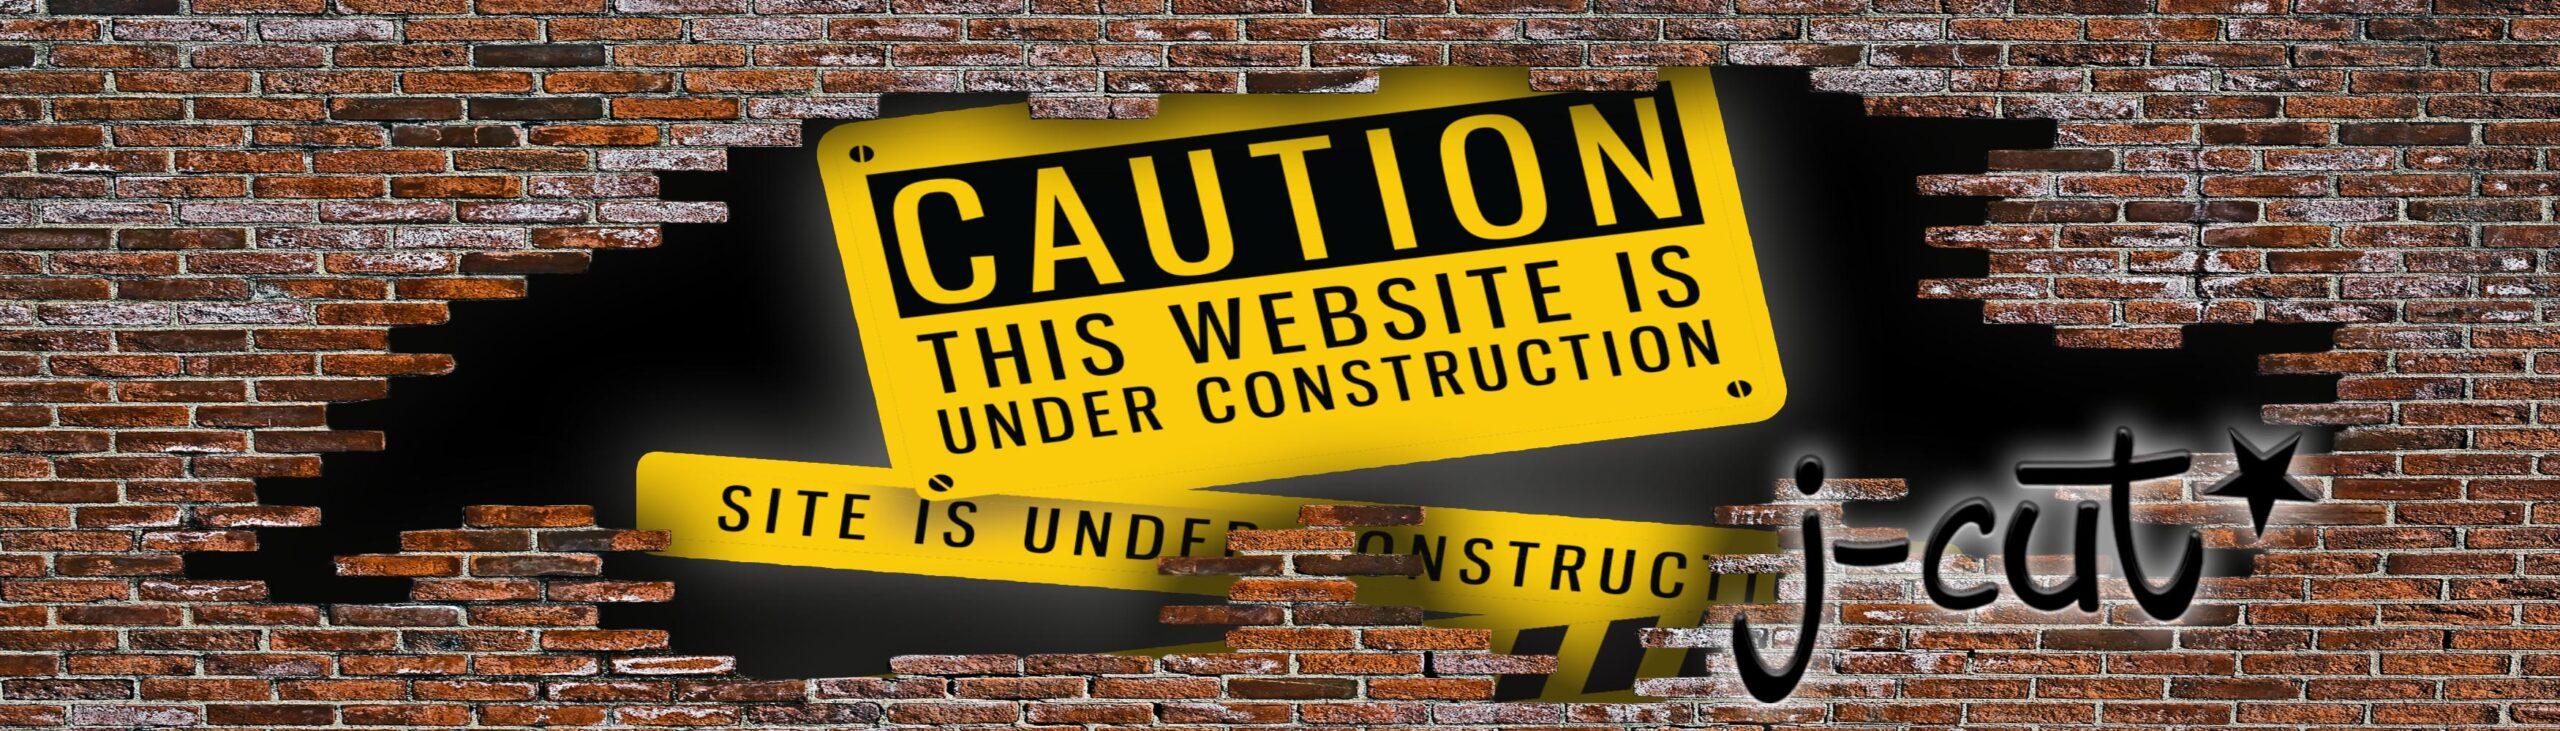 WebsiteUnder Construction3 scaled - Aufkleber